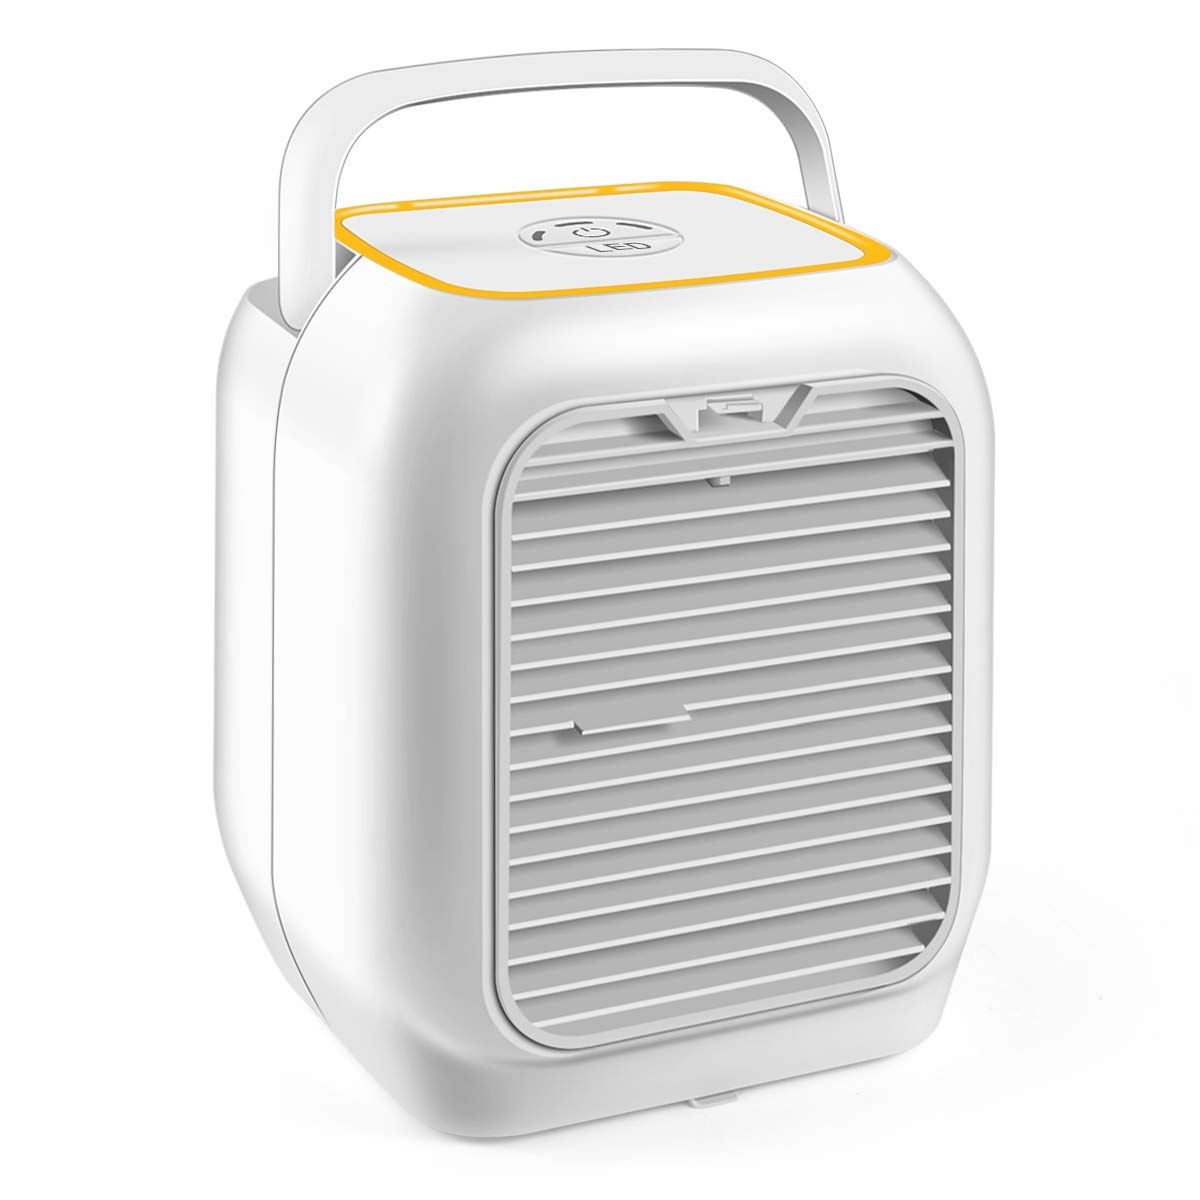 VANTAKOOL Personal Air Conditioner Fan, Air Personal Space Cooler 9.5-inch Small Desktop Fan Quiet Personal Table Fan Mini Evaporative Air Circulator Cooler Humidifier Bladeless Quiet for Office, Dorm